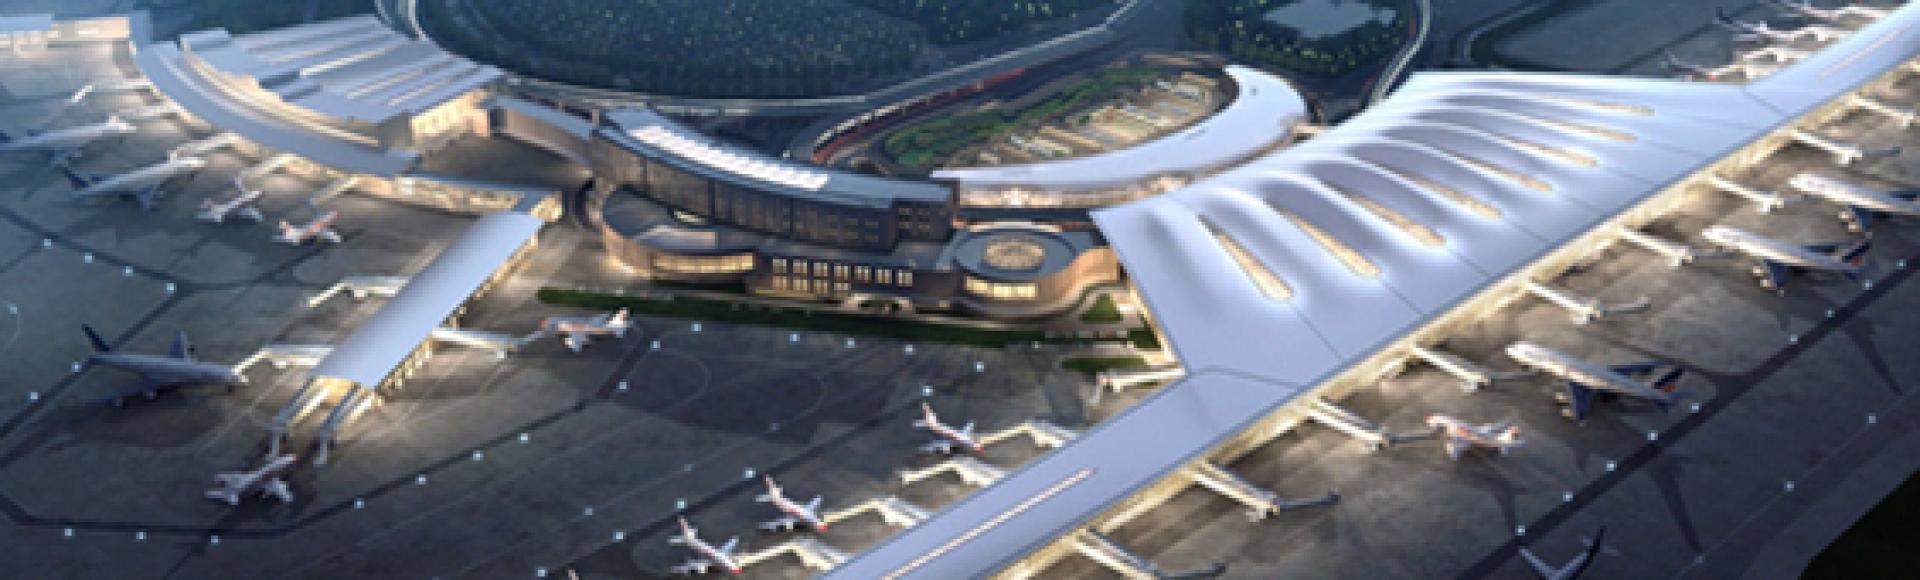 Nanjing International Airport